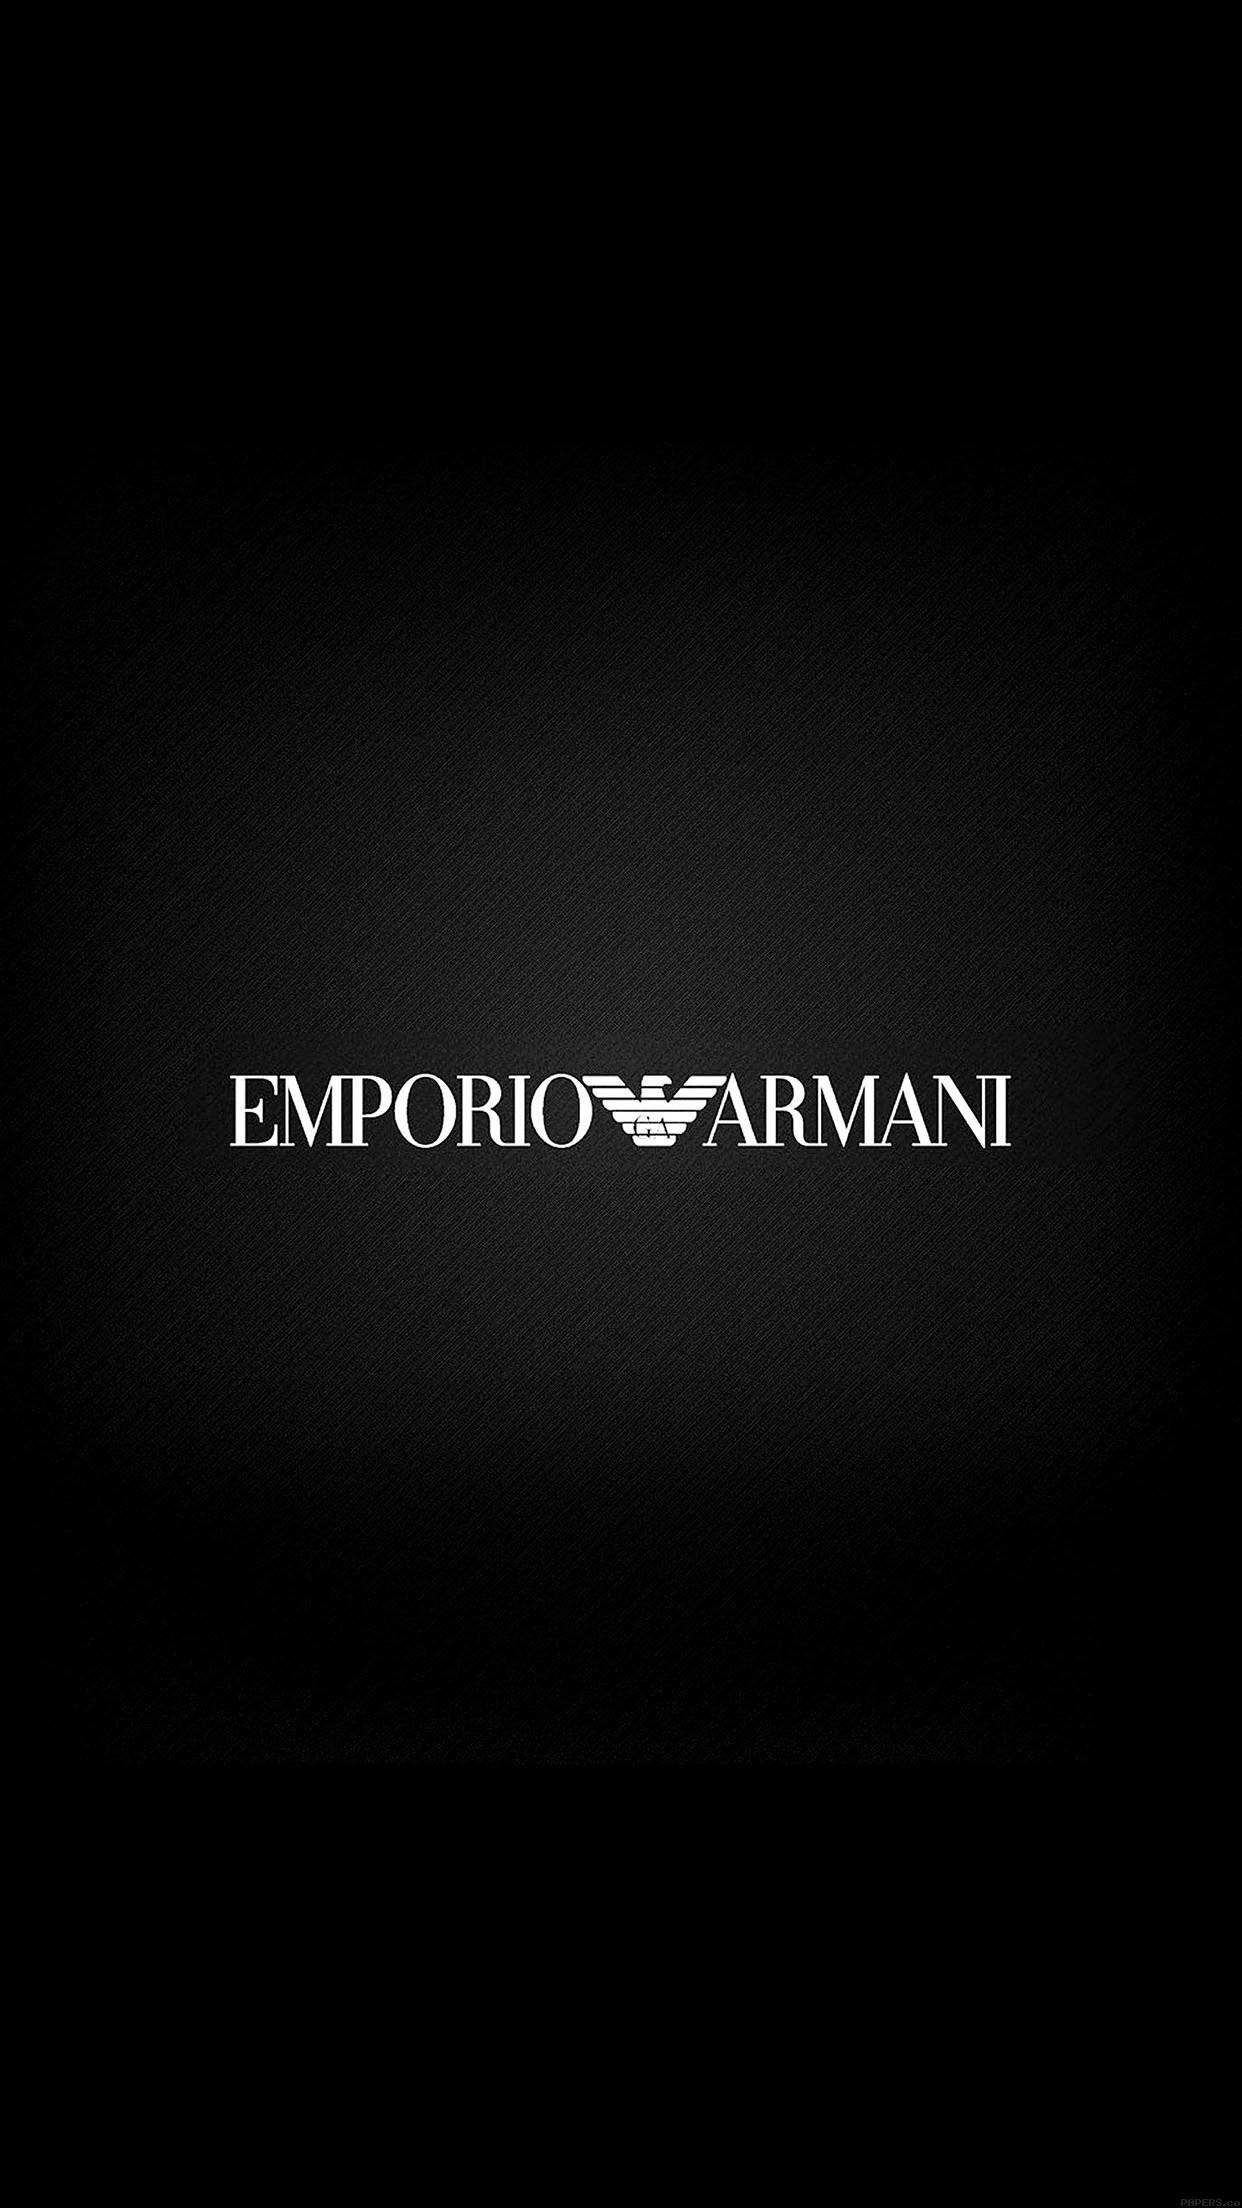 Armani Wallpaper 72 Images